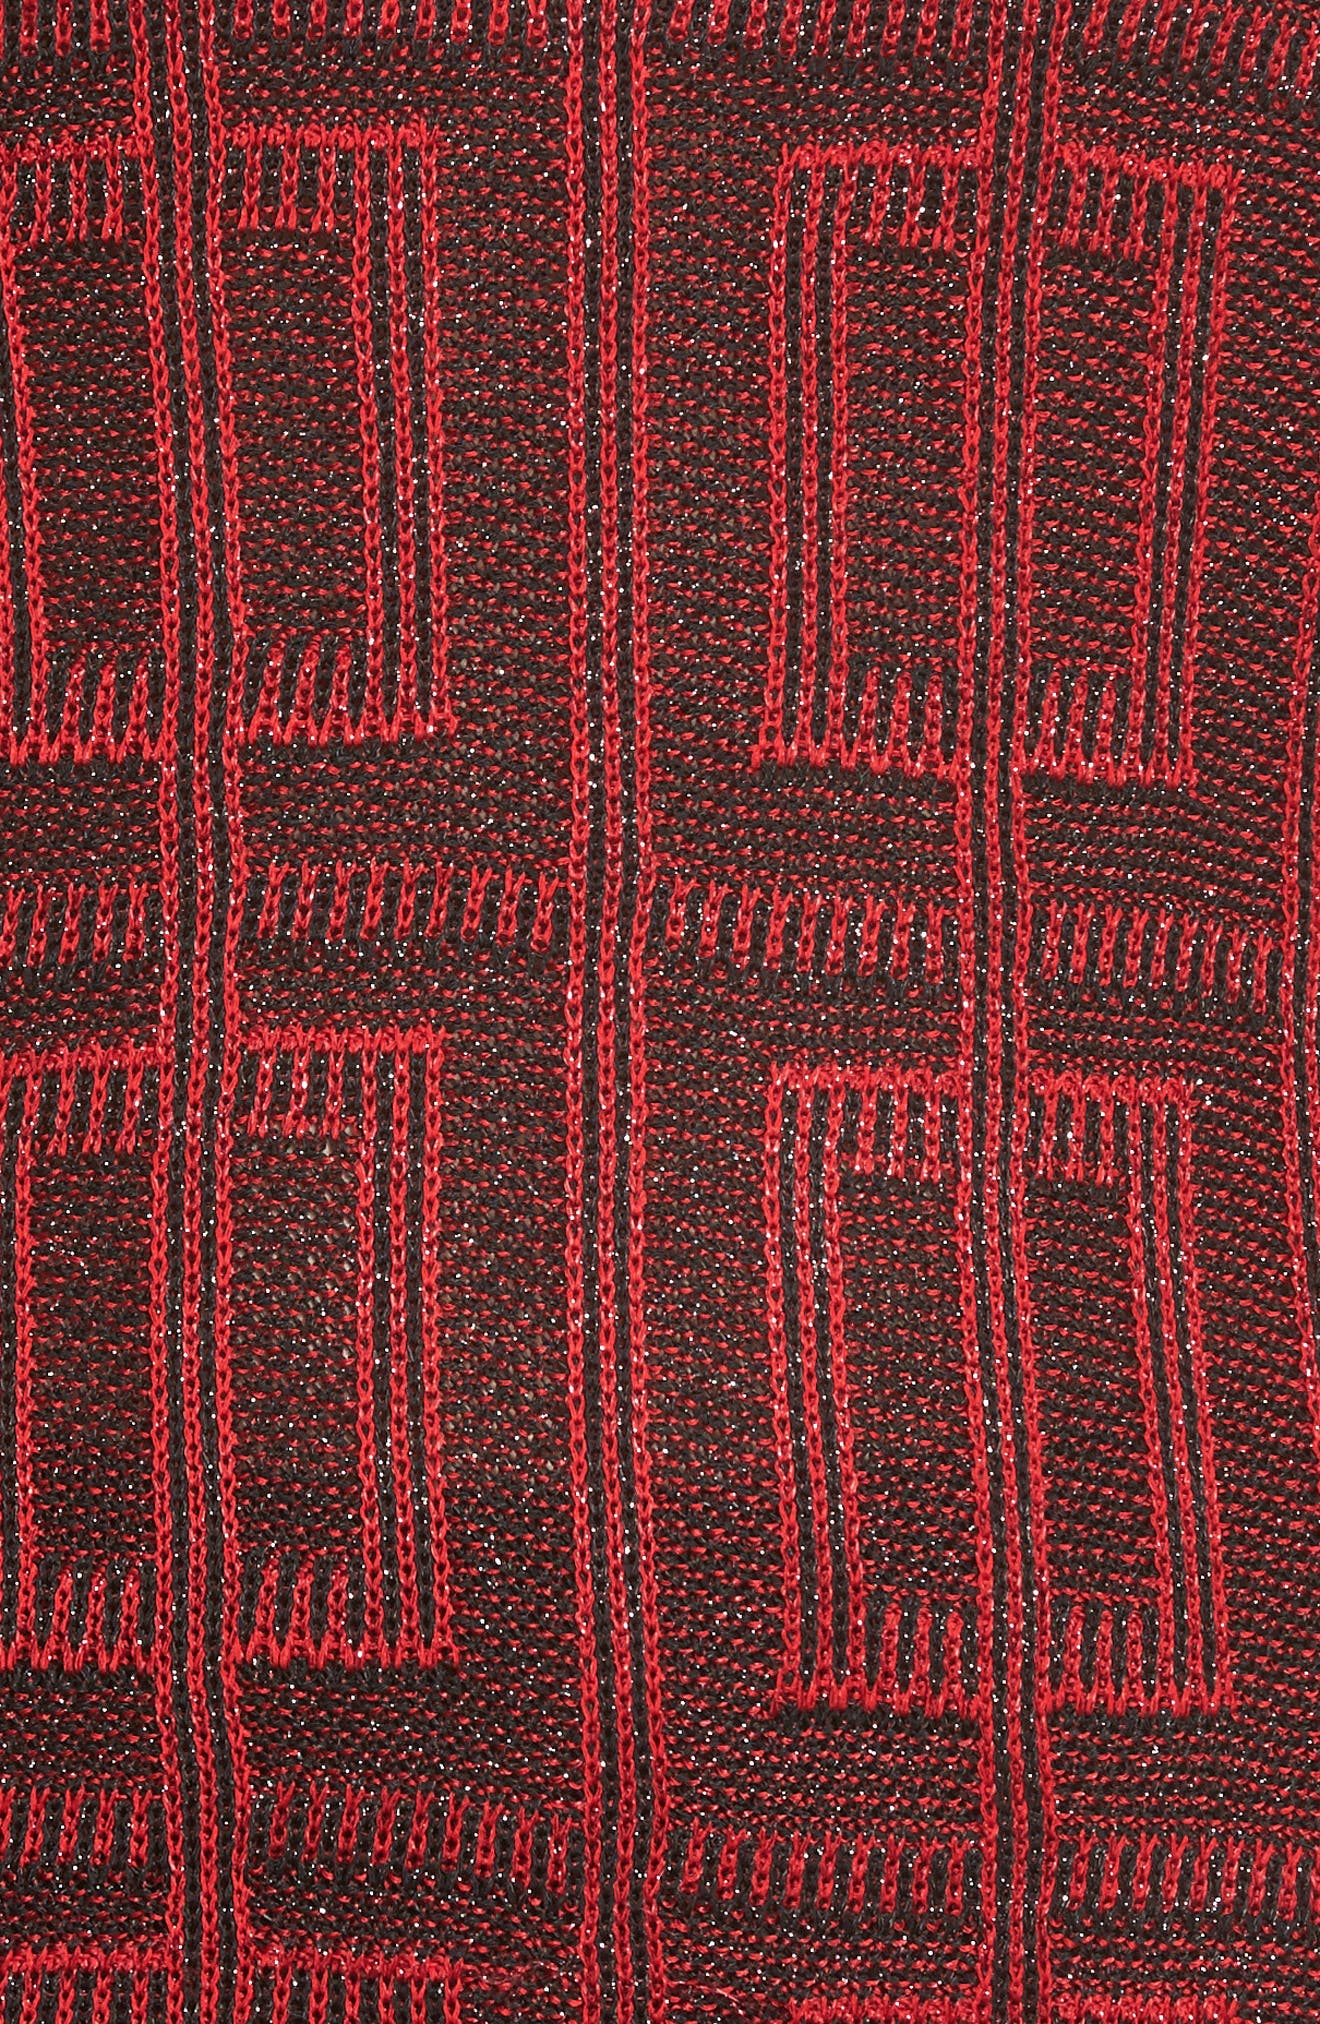 Scoop Neck Tweed Knit,                             Alternate thumbnail 5, color,                             Dusk Red/ Black